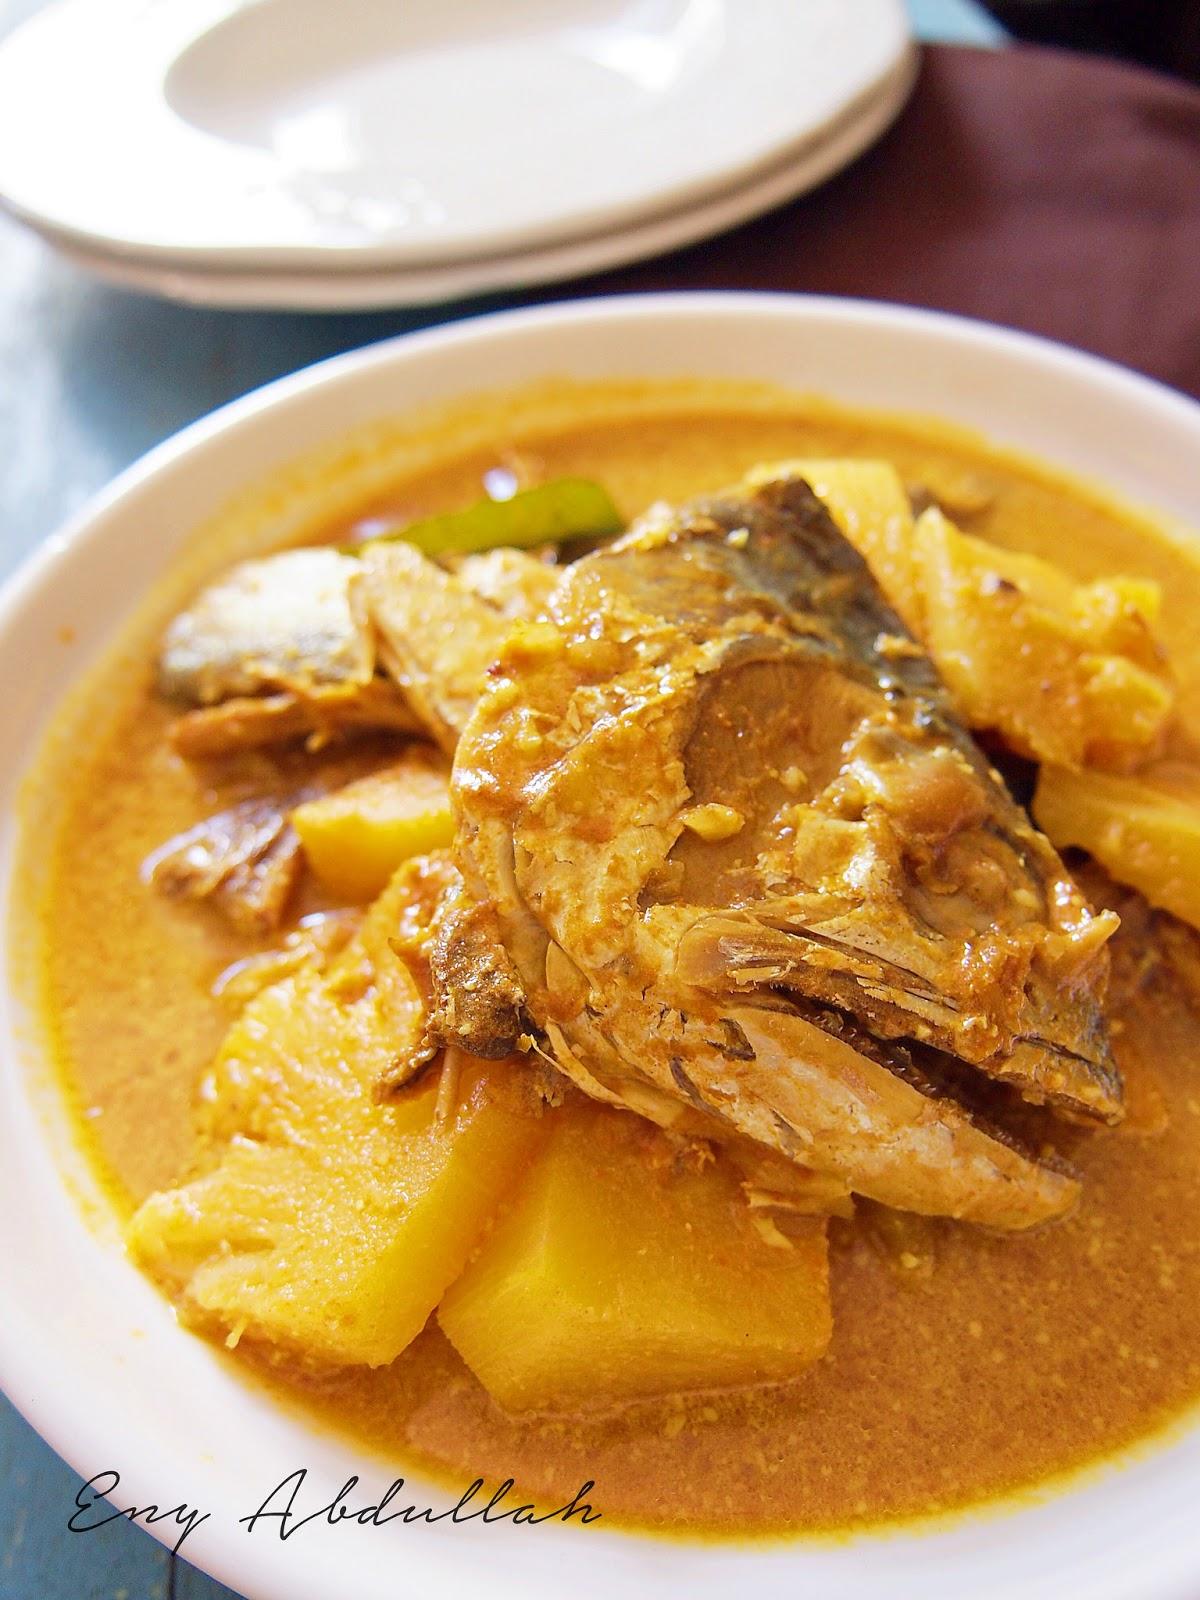 resepi gulai ikan nanas  descargar Resepi Ikan Mas Bakar Sunda Enak dan Mudah